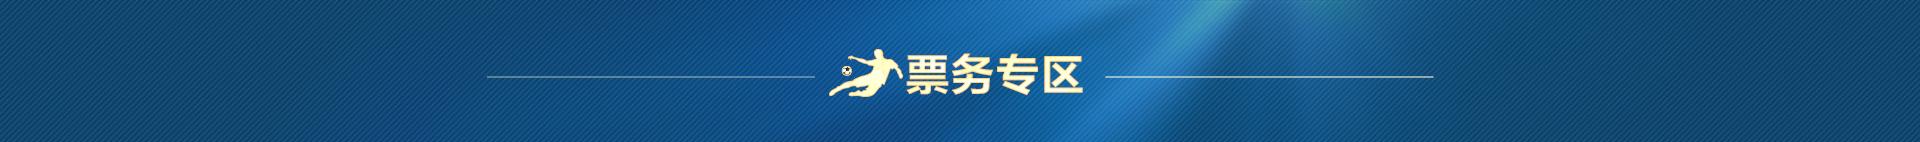 http://image.suning.cn/uimg/sop/commodity/159507138818914709027013_x.jpg